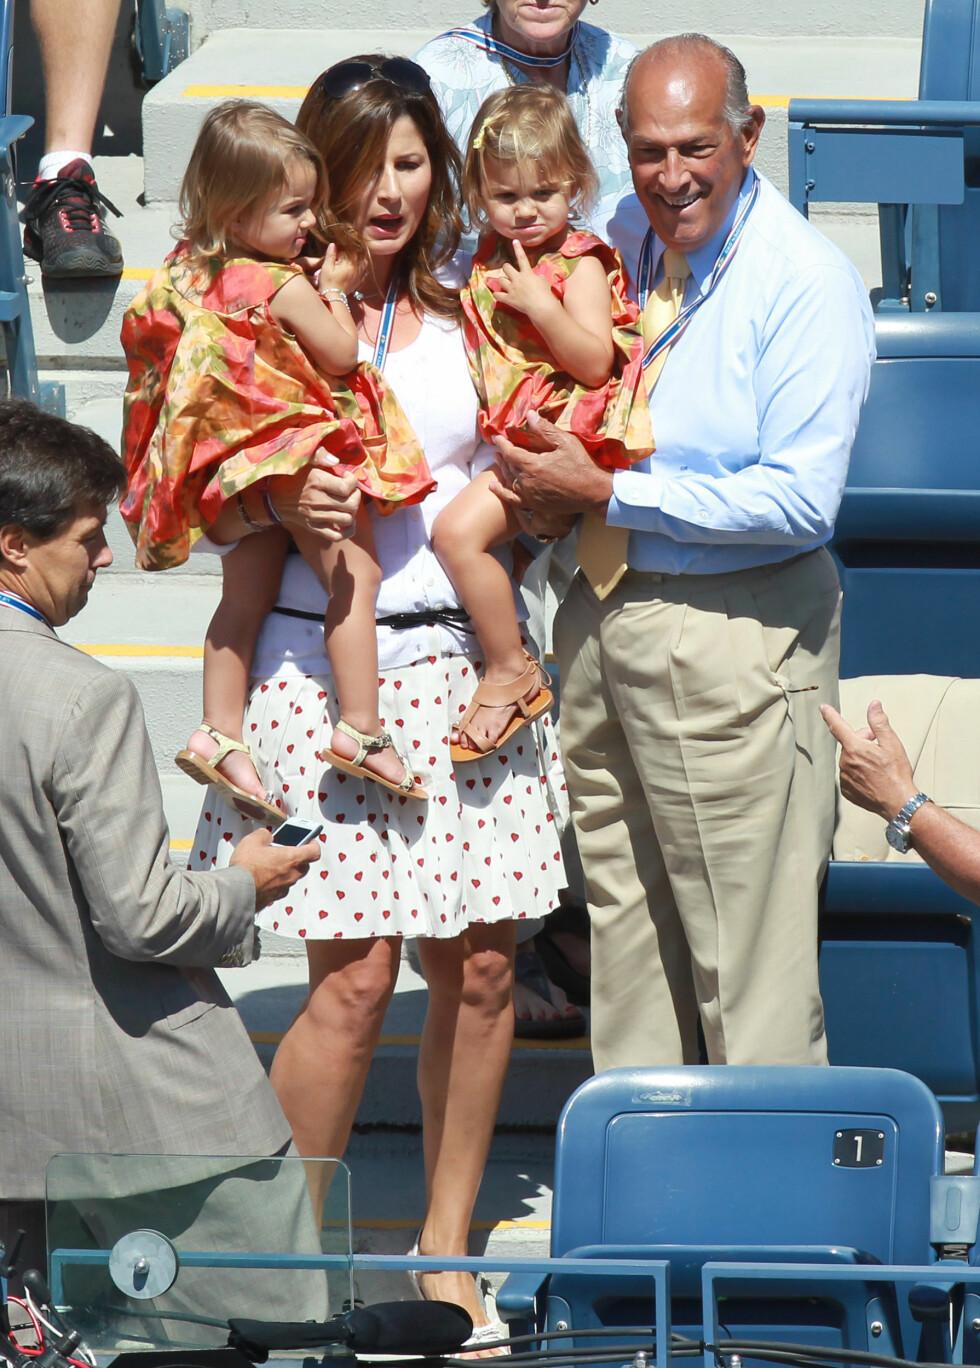 TVILLINGER: Her viser Roger Federers kone Mirka fram deres to tvillingdøtre, Myla og Charlene. Snart blir de to jentene storesøstre. Foto: Stella Pictures